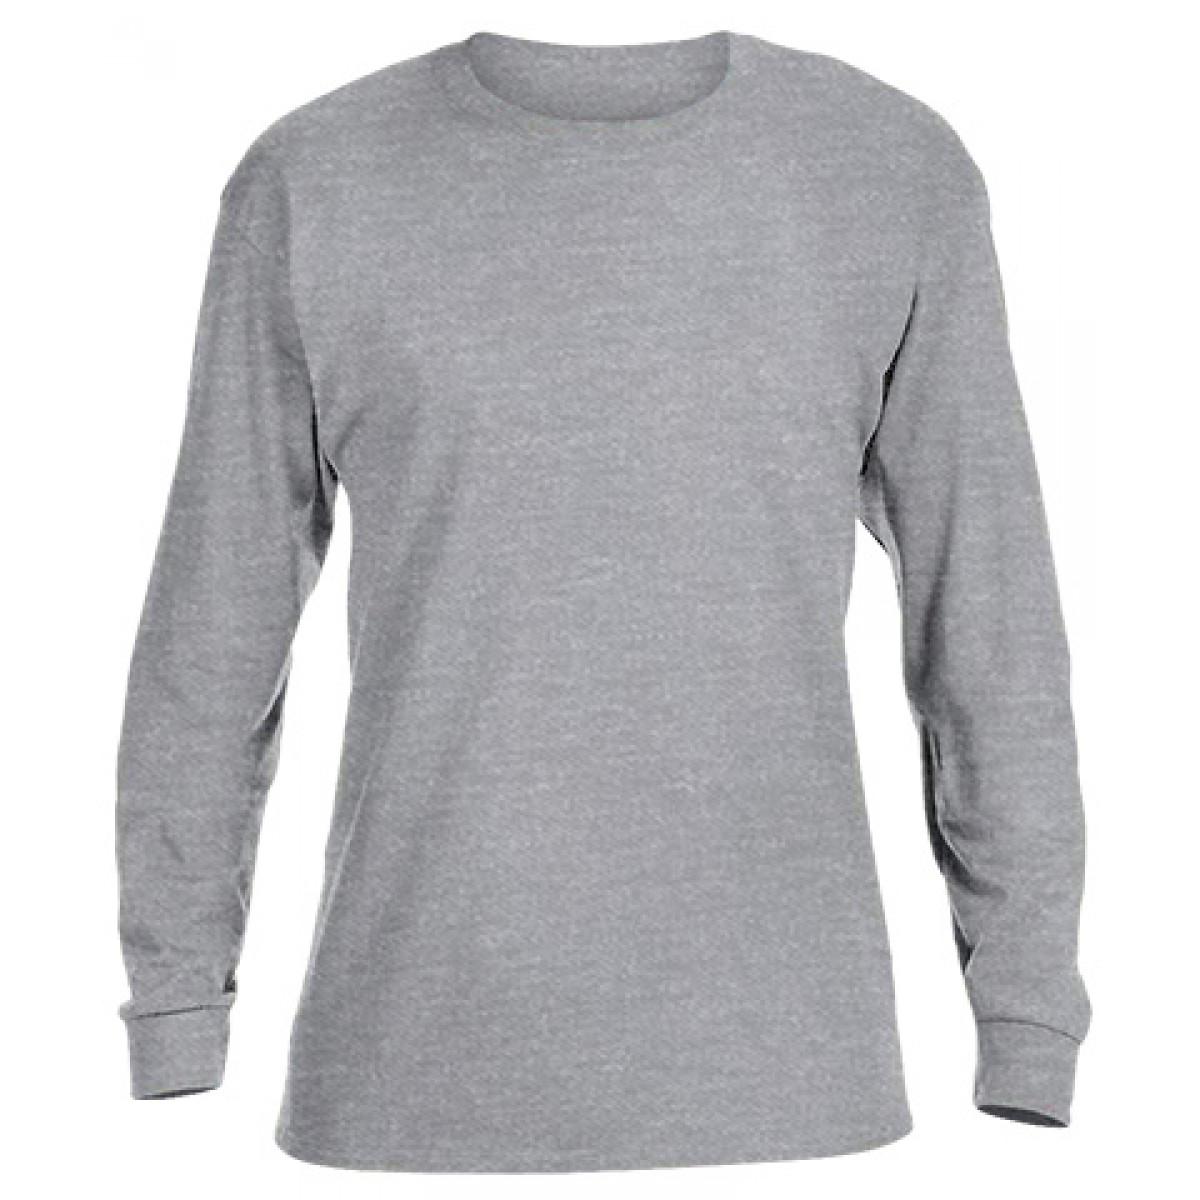 Basic Long Sleeve Crew Neck -Ash Gray-YL